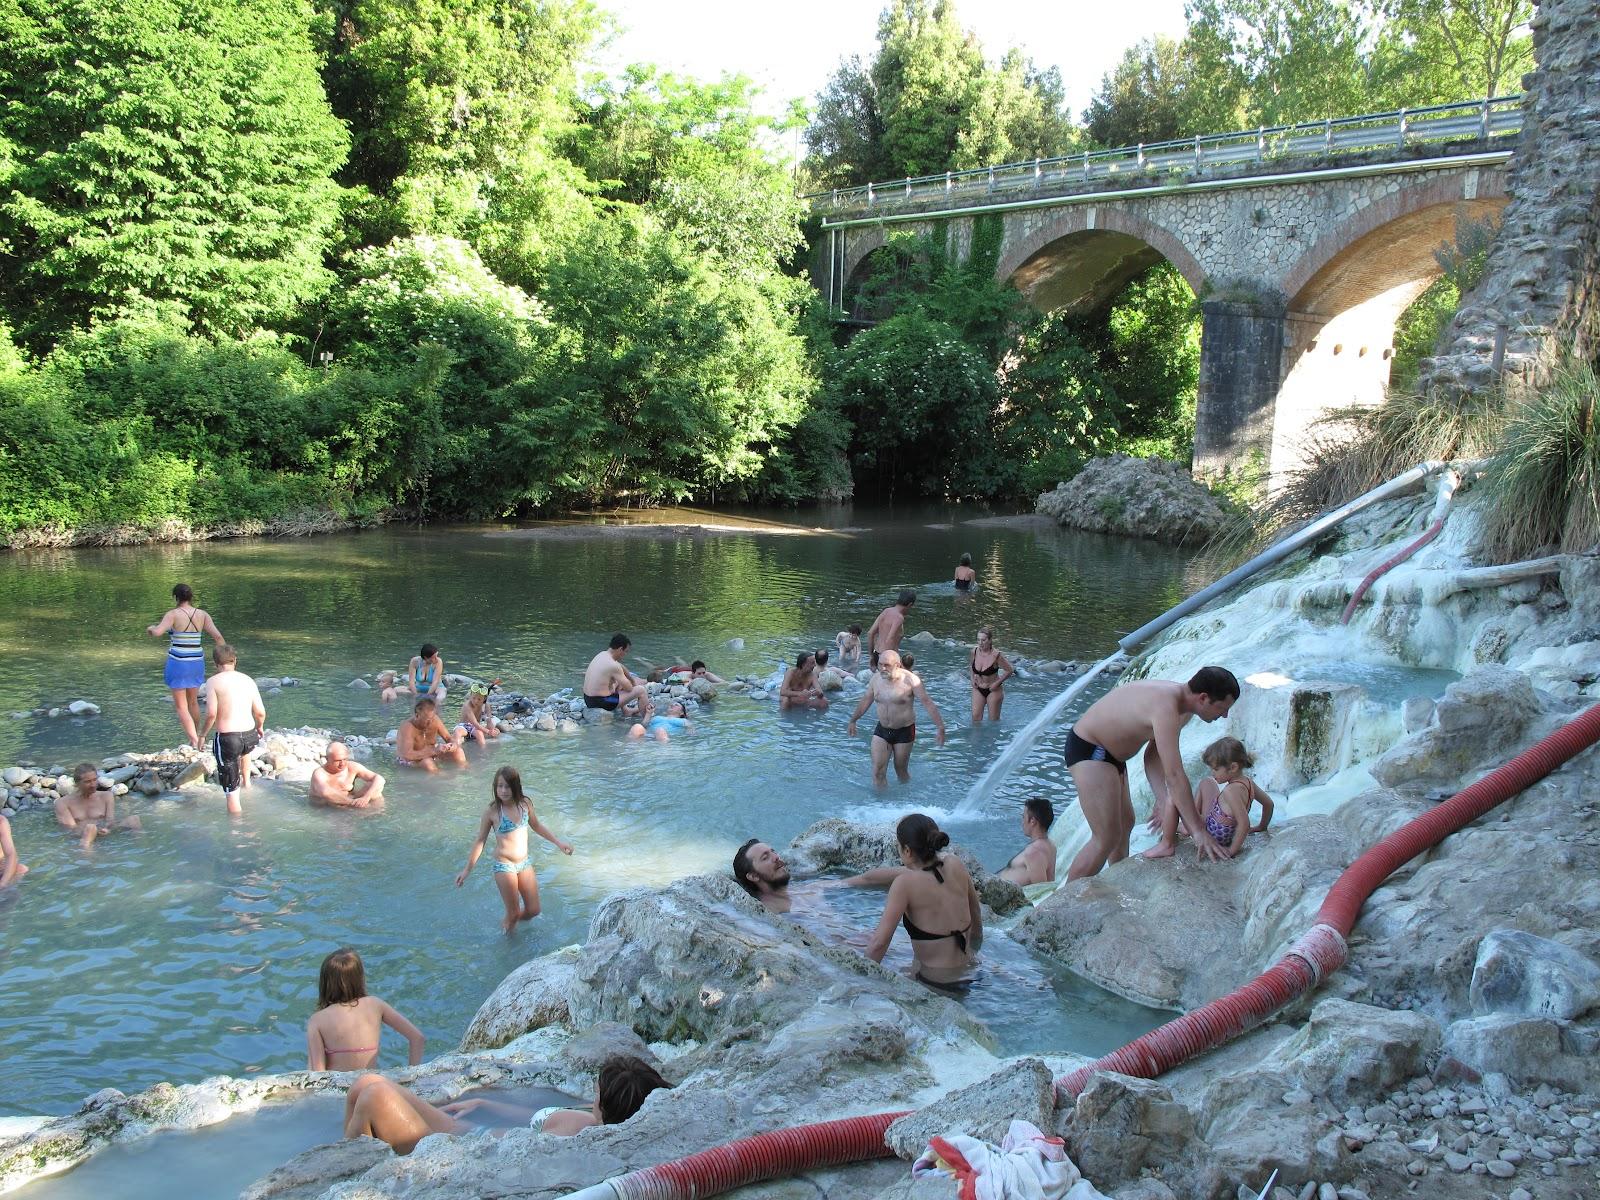 Toscana tuscany toskana luglio 2012 - Bagni di petriolo ...